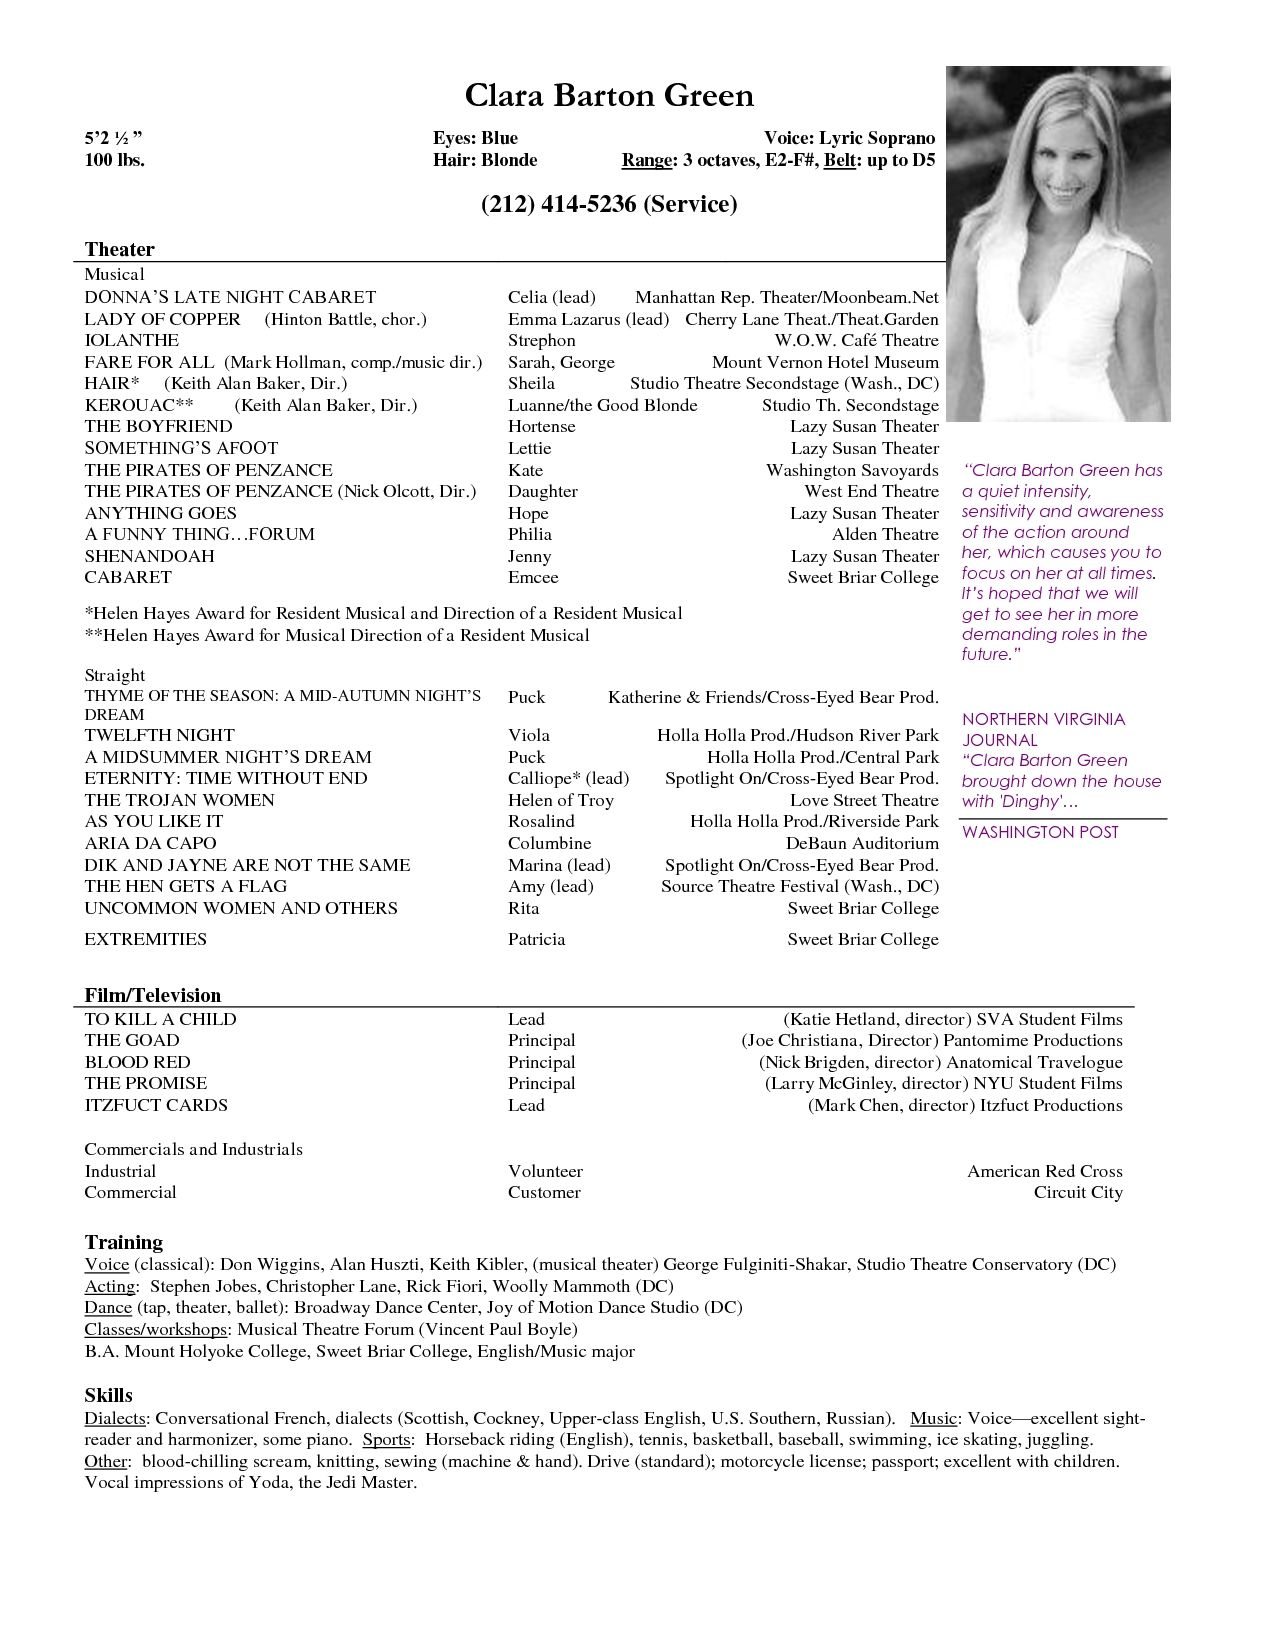 pin by kaminakhan on download pinterest resume sample resume